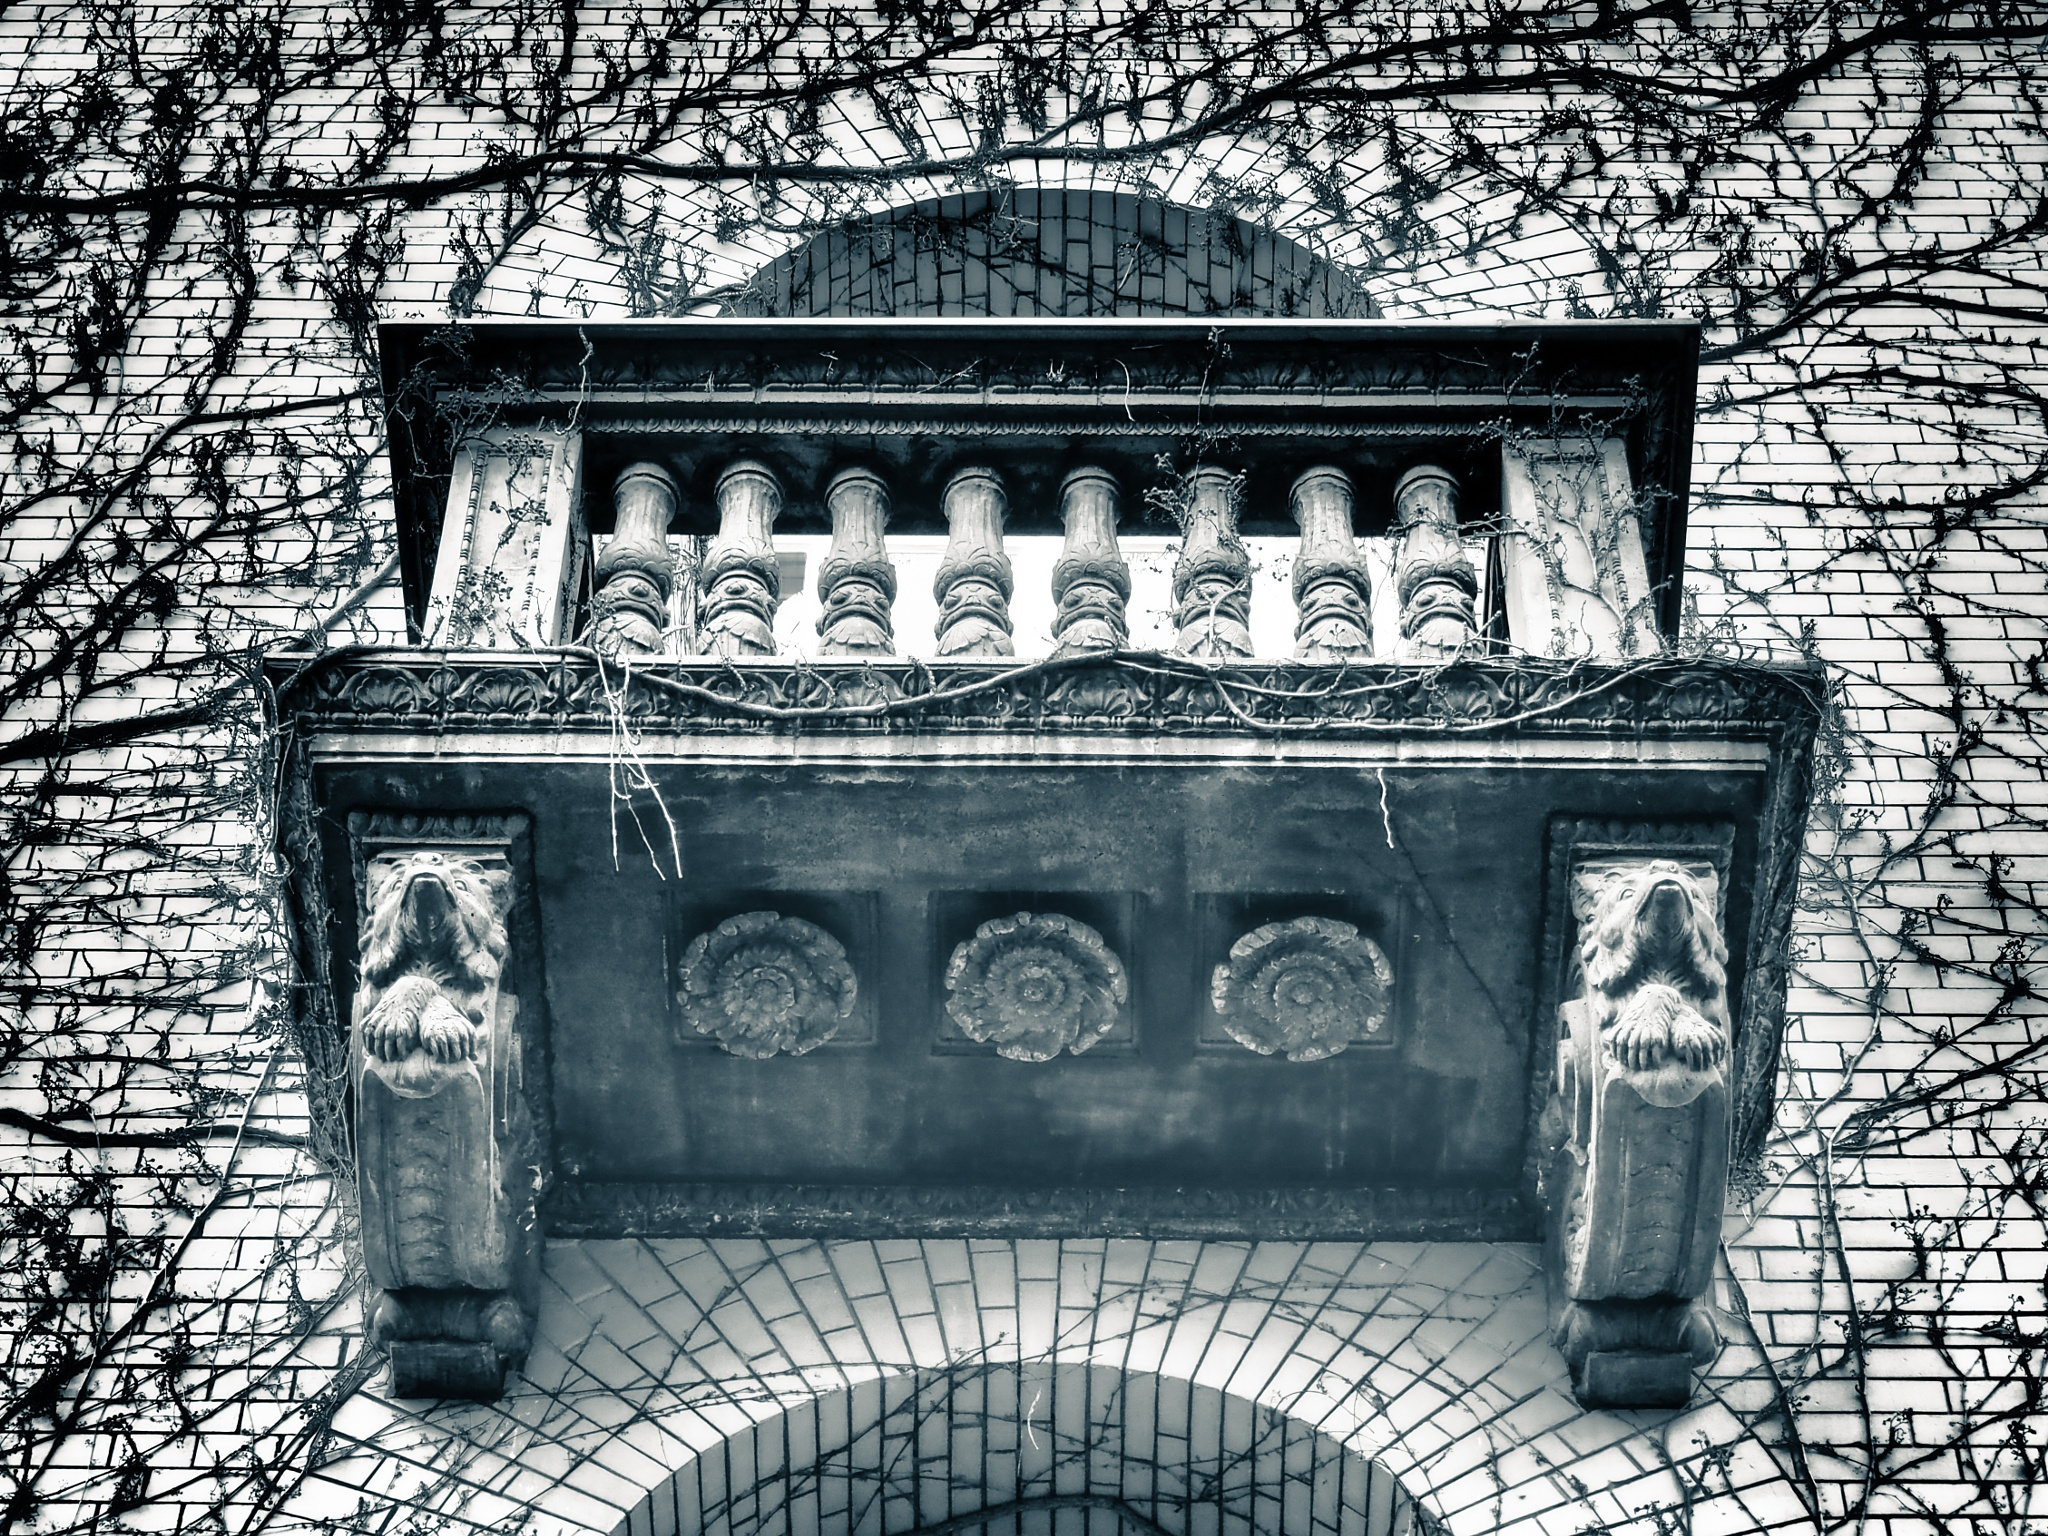 Berlin Balcony Black & White by Jeans Brown Photography / Jens Schwarz